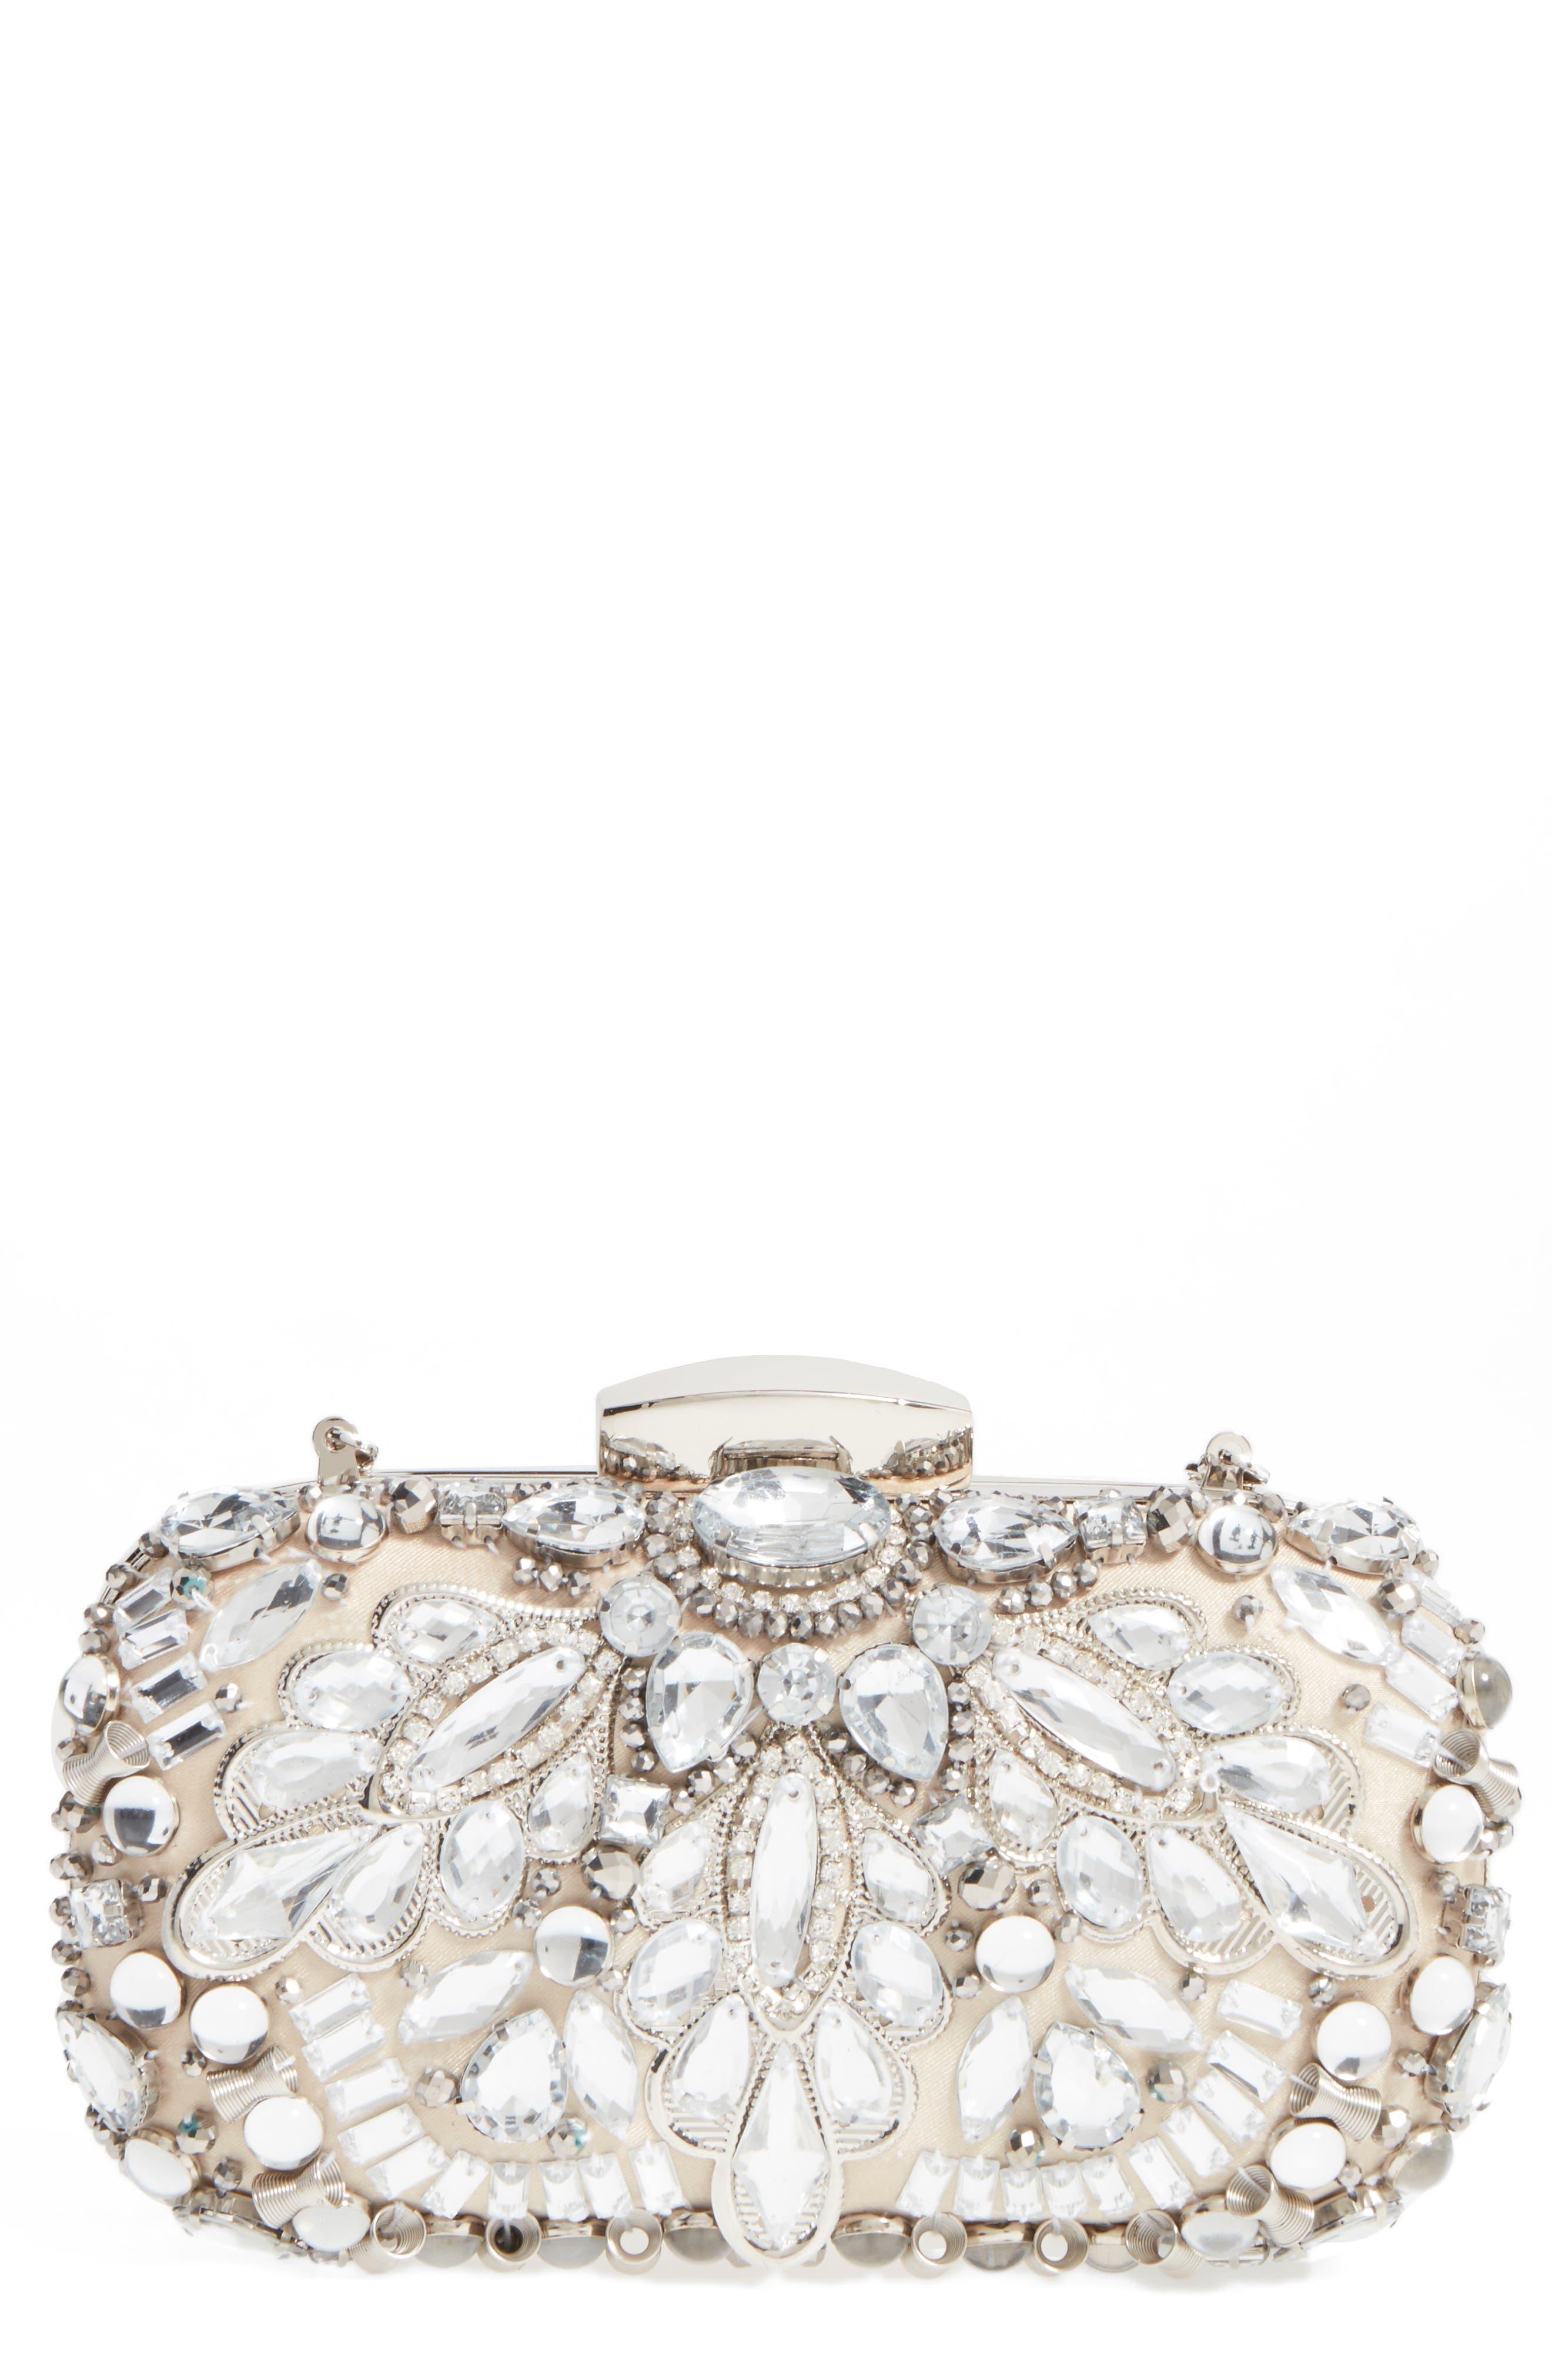 Main Image - Natasha Couture Crystal Embellished Frame Clutch